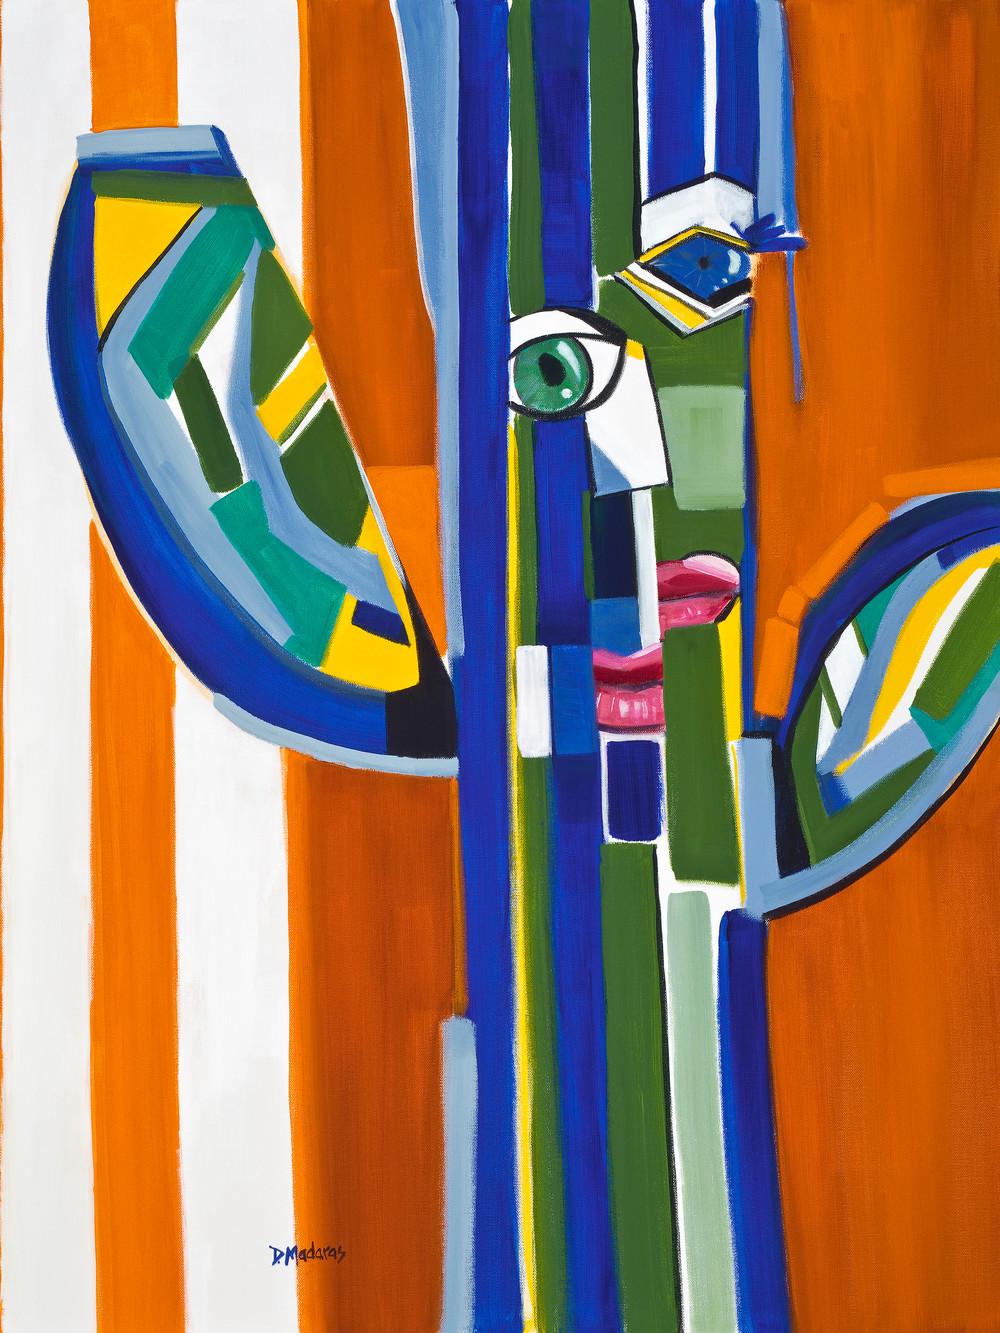 Southwest Art   Madaras   Saguaro Picasso   Tucson Art Gallery